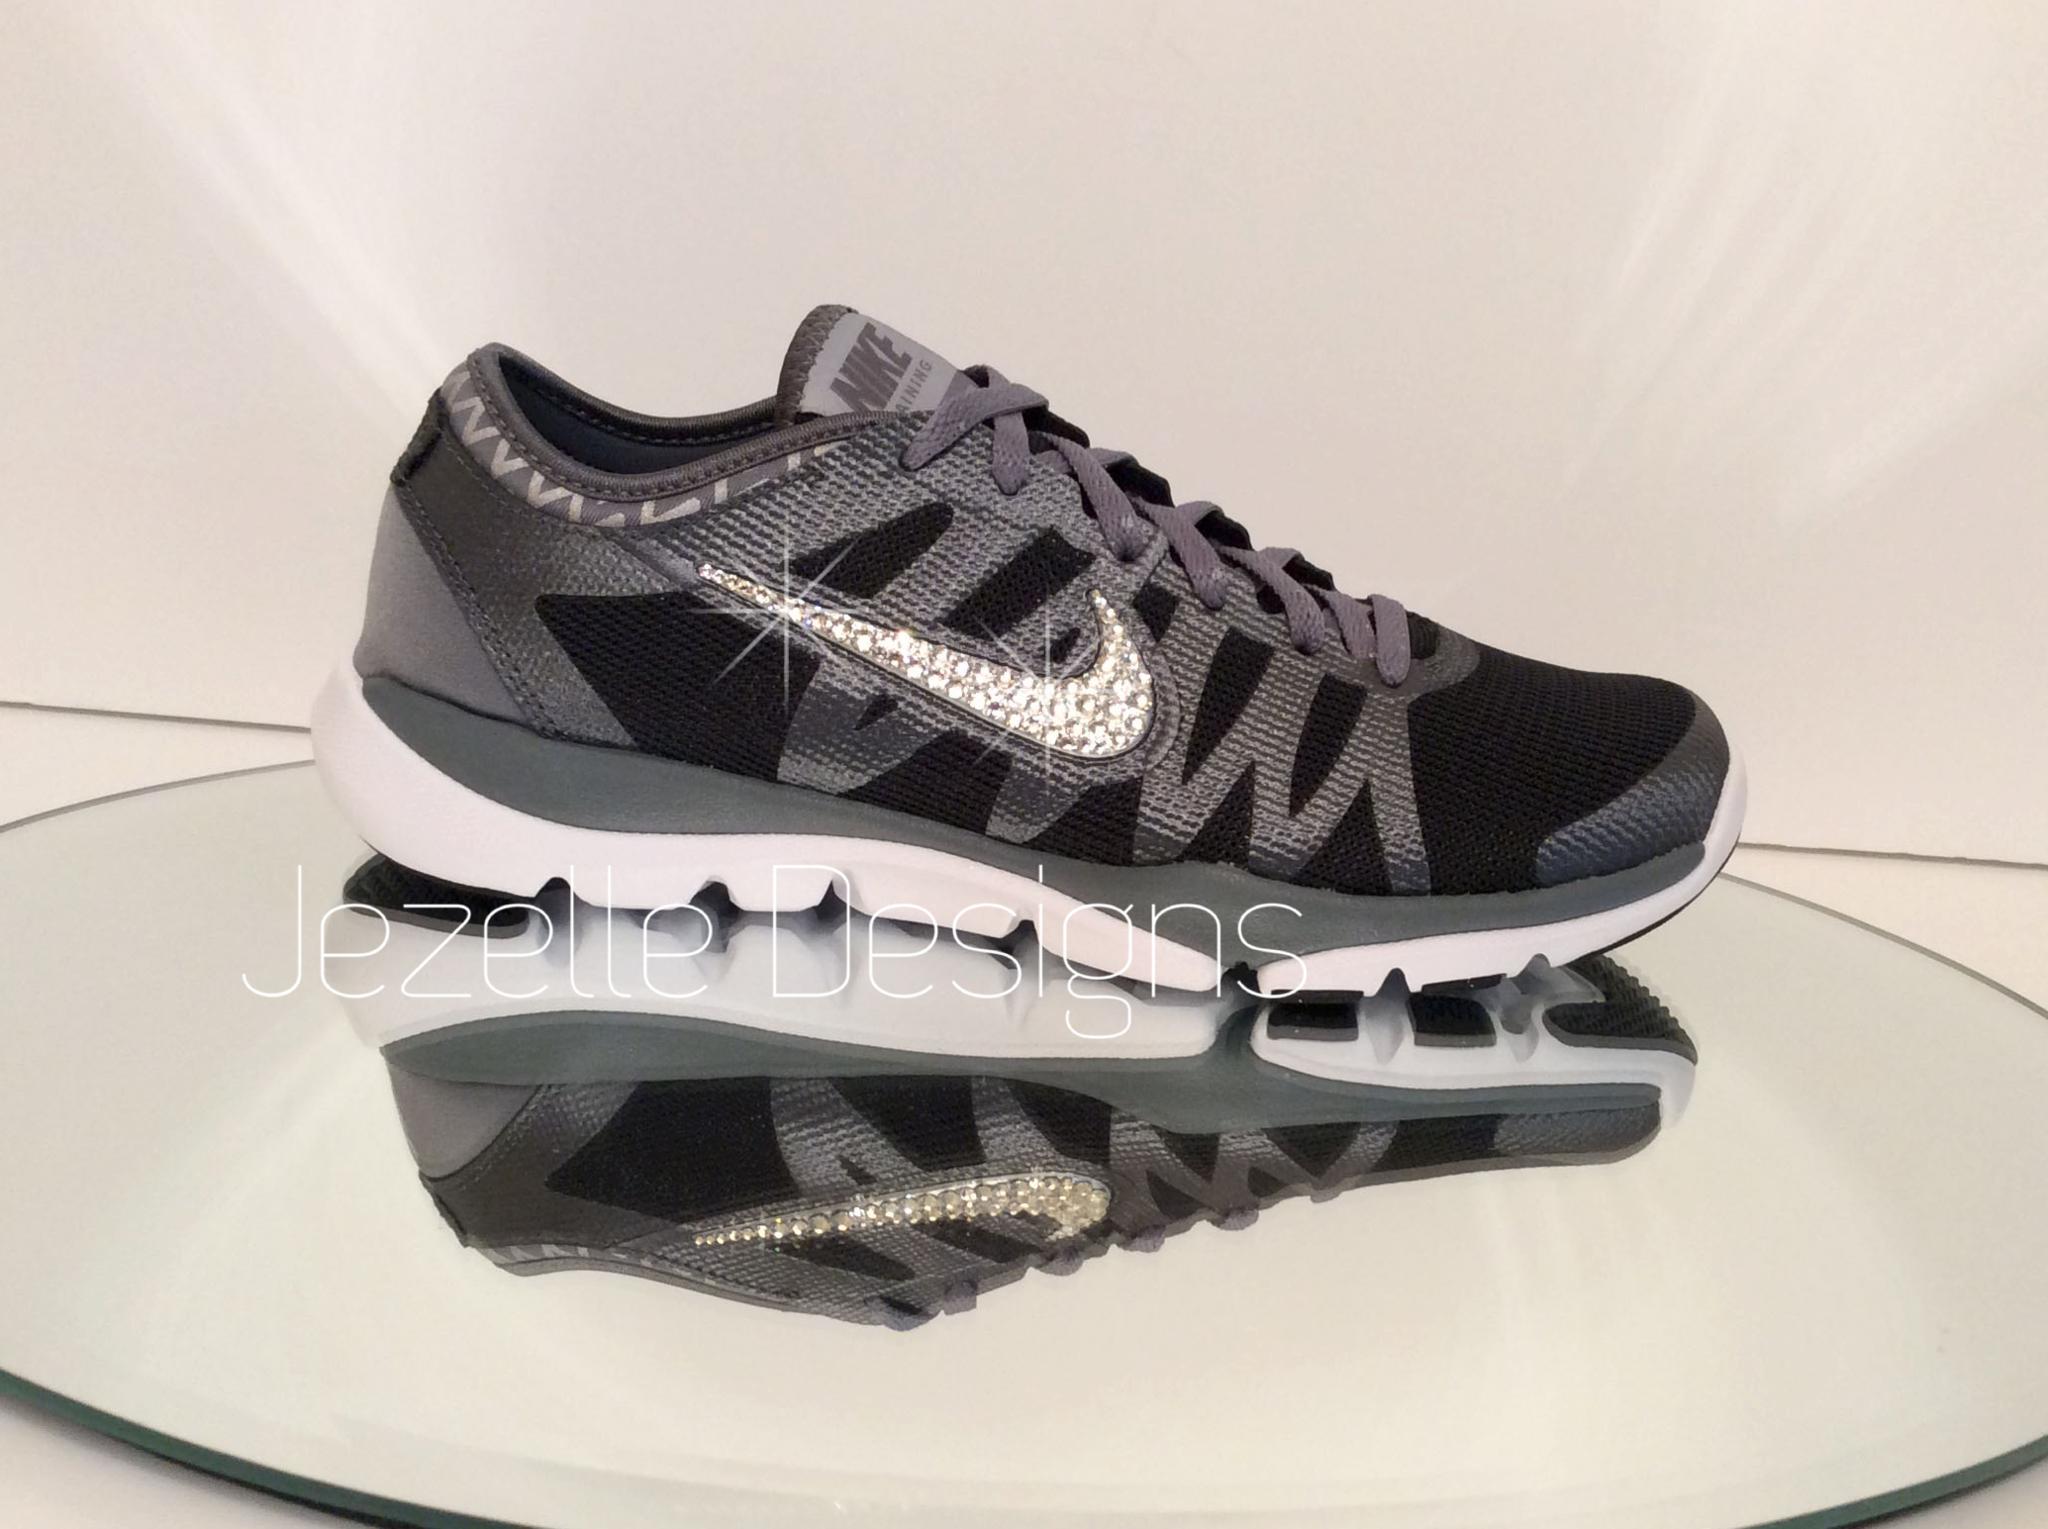 Nike Flex Supreme Swarovski Bling Sneakers - Black 6eba7a052d68